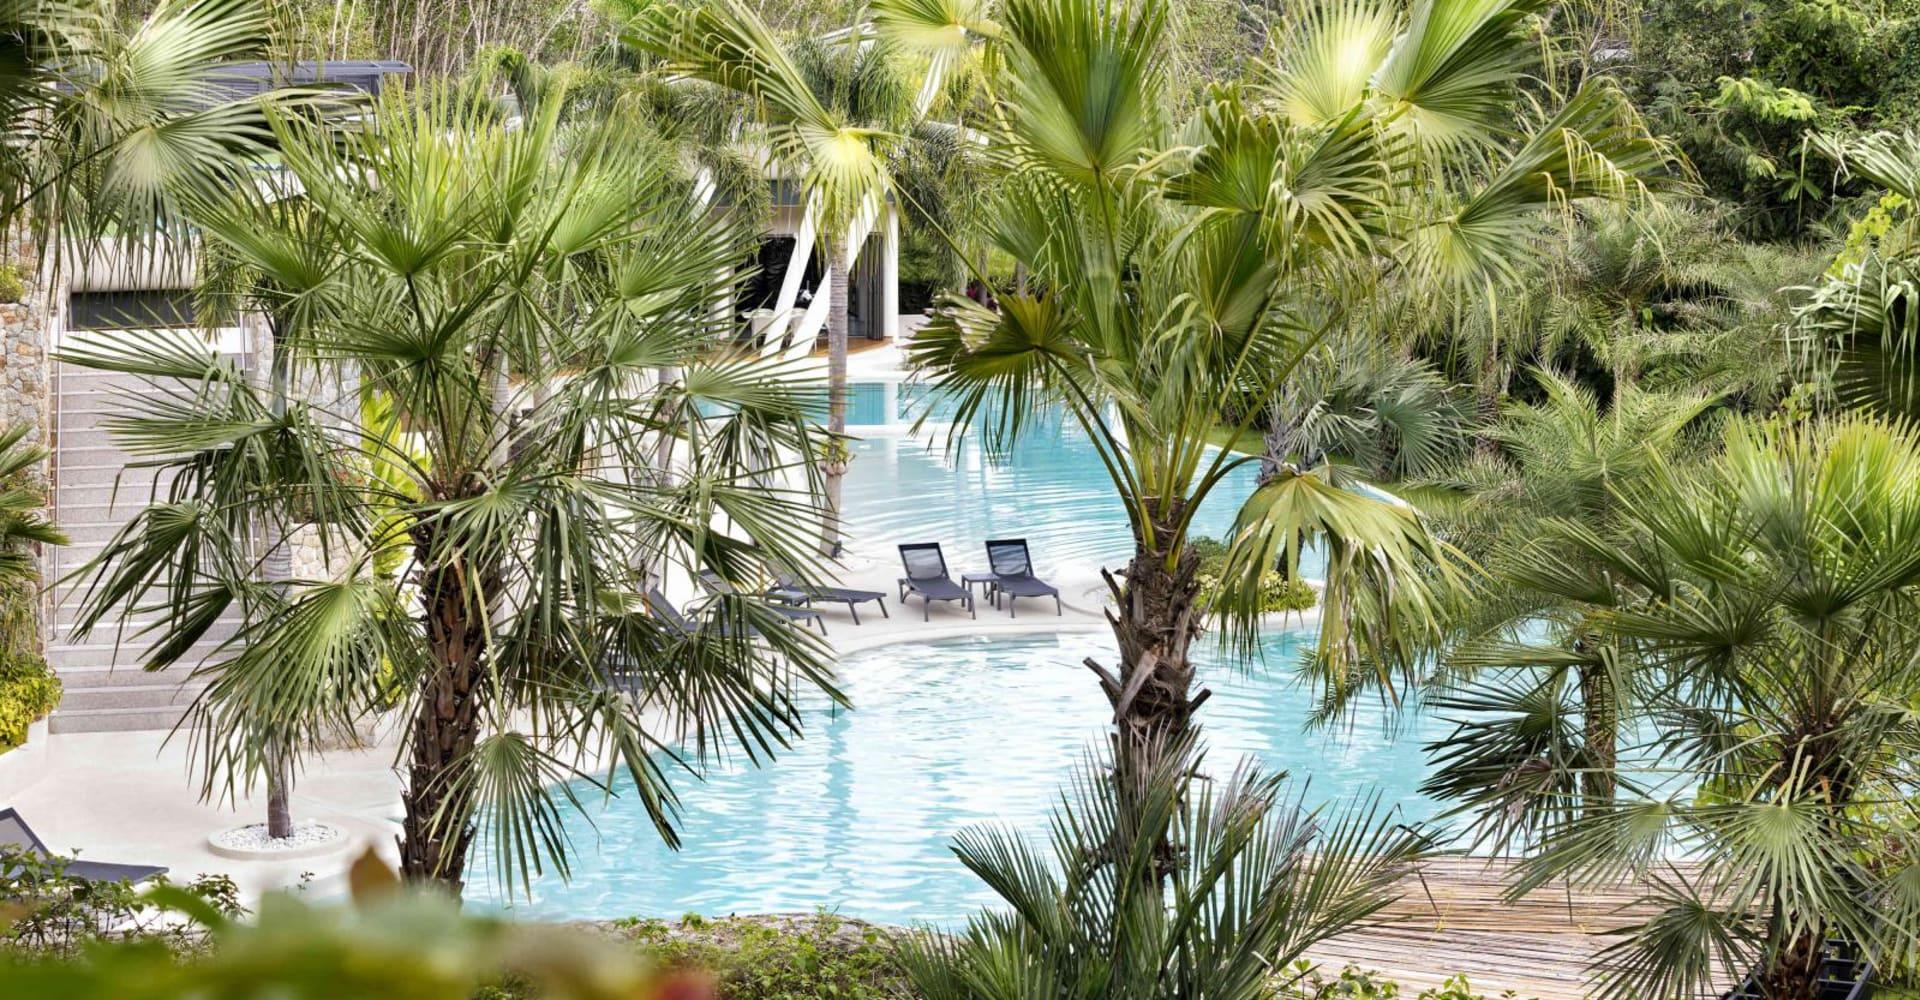 Resort Pools - The Pavilions Phuket